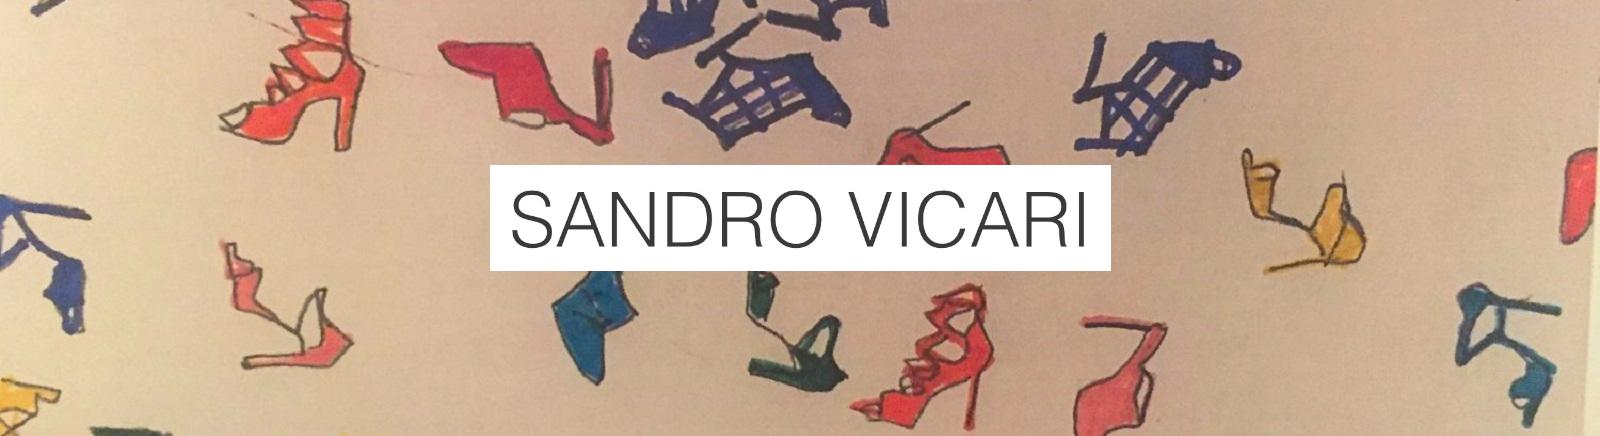 Sandro Vicari Markenschuhe online bestellen im Prange Shop